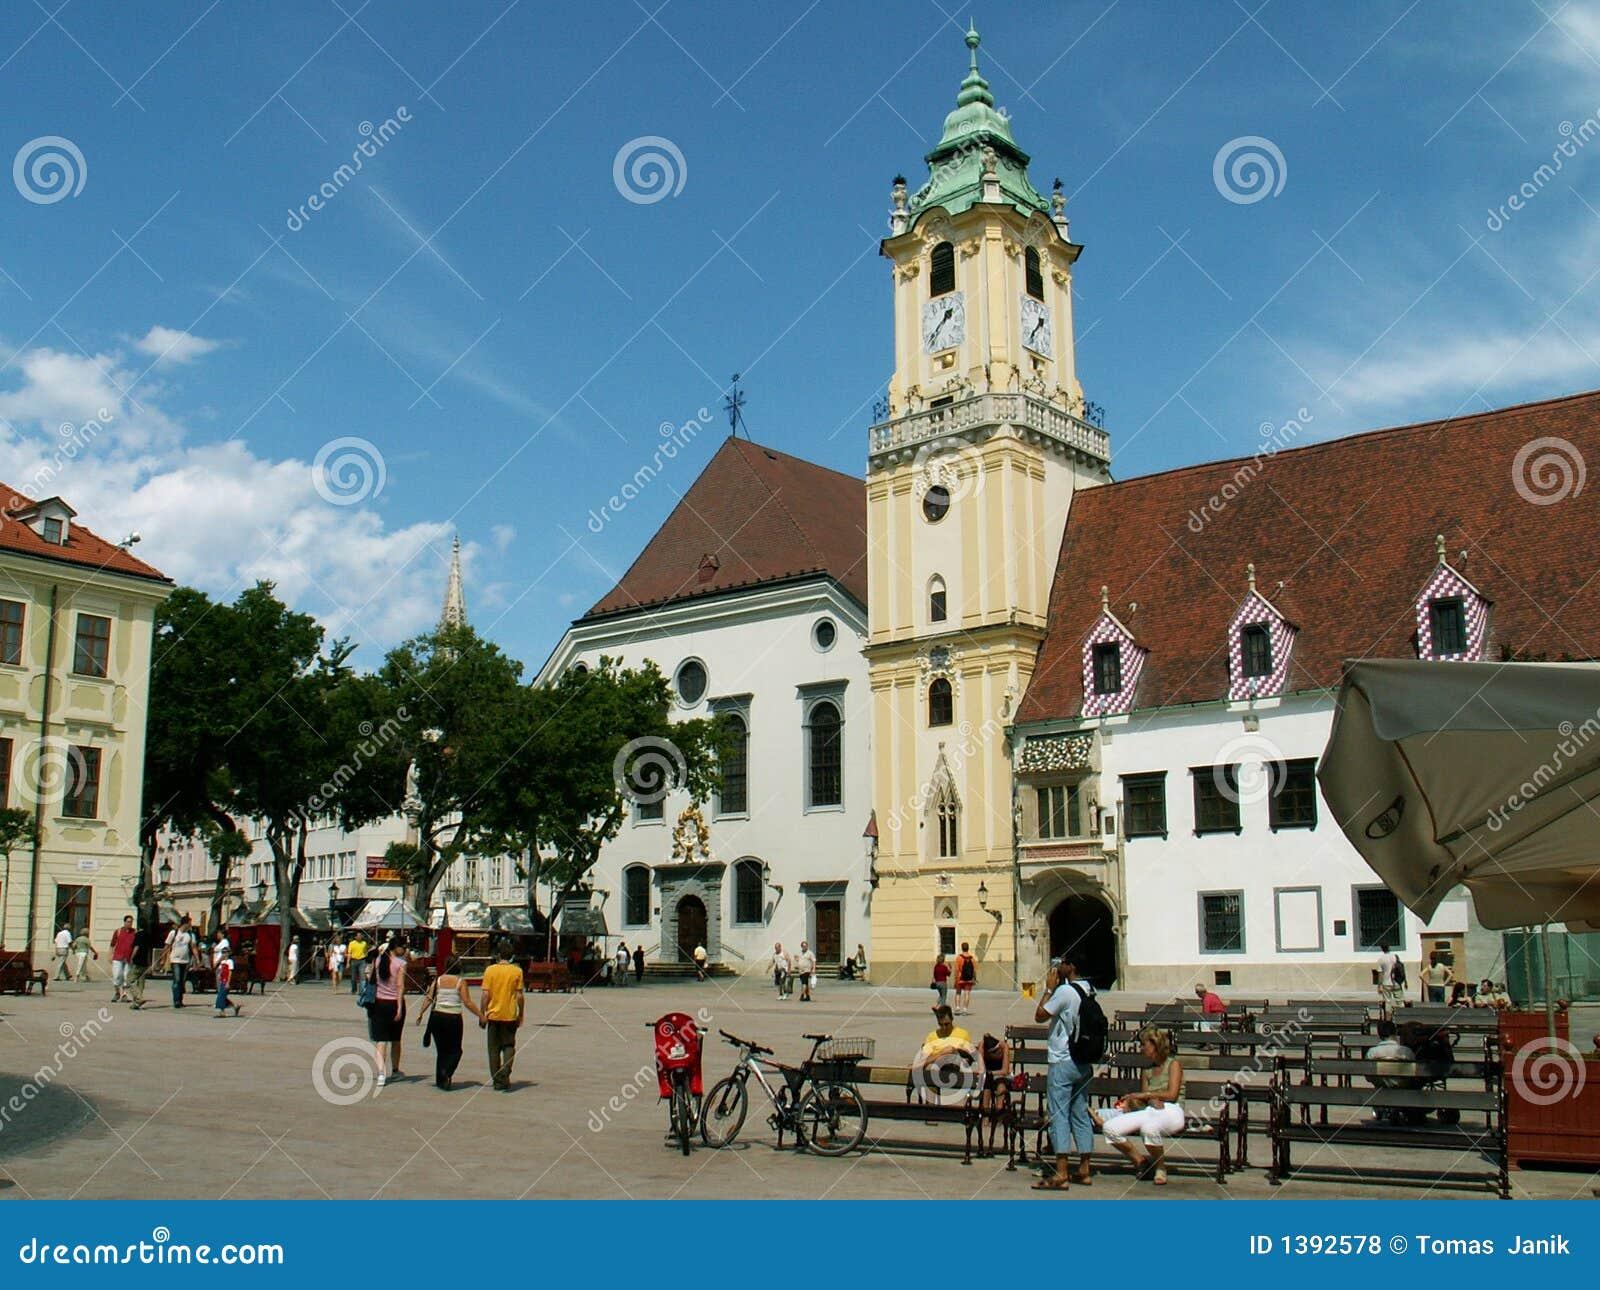 Bratislava central square